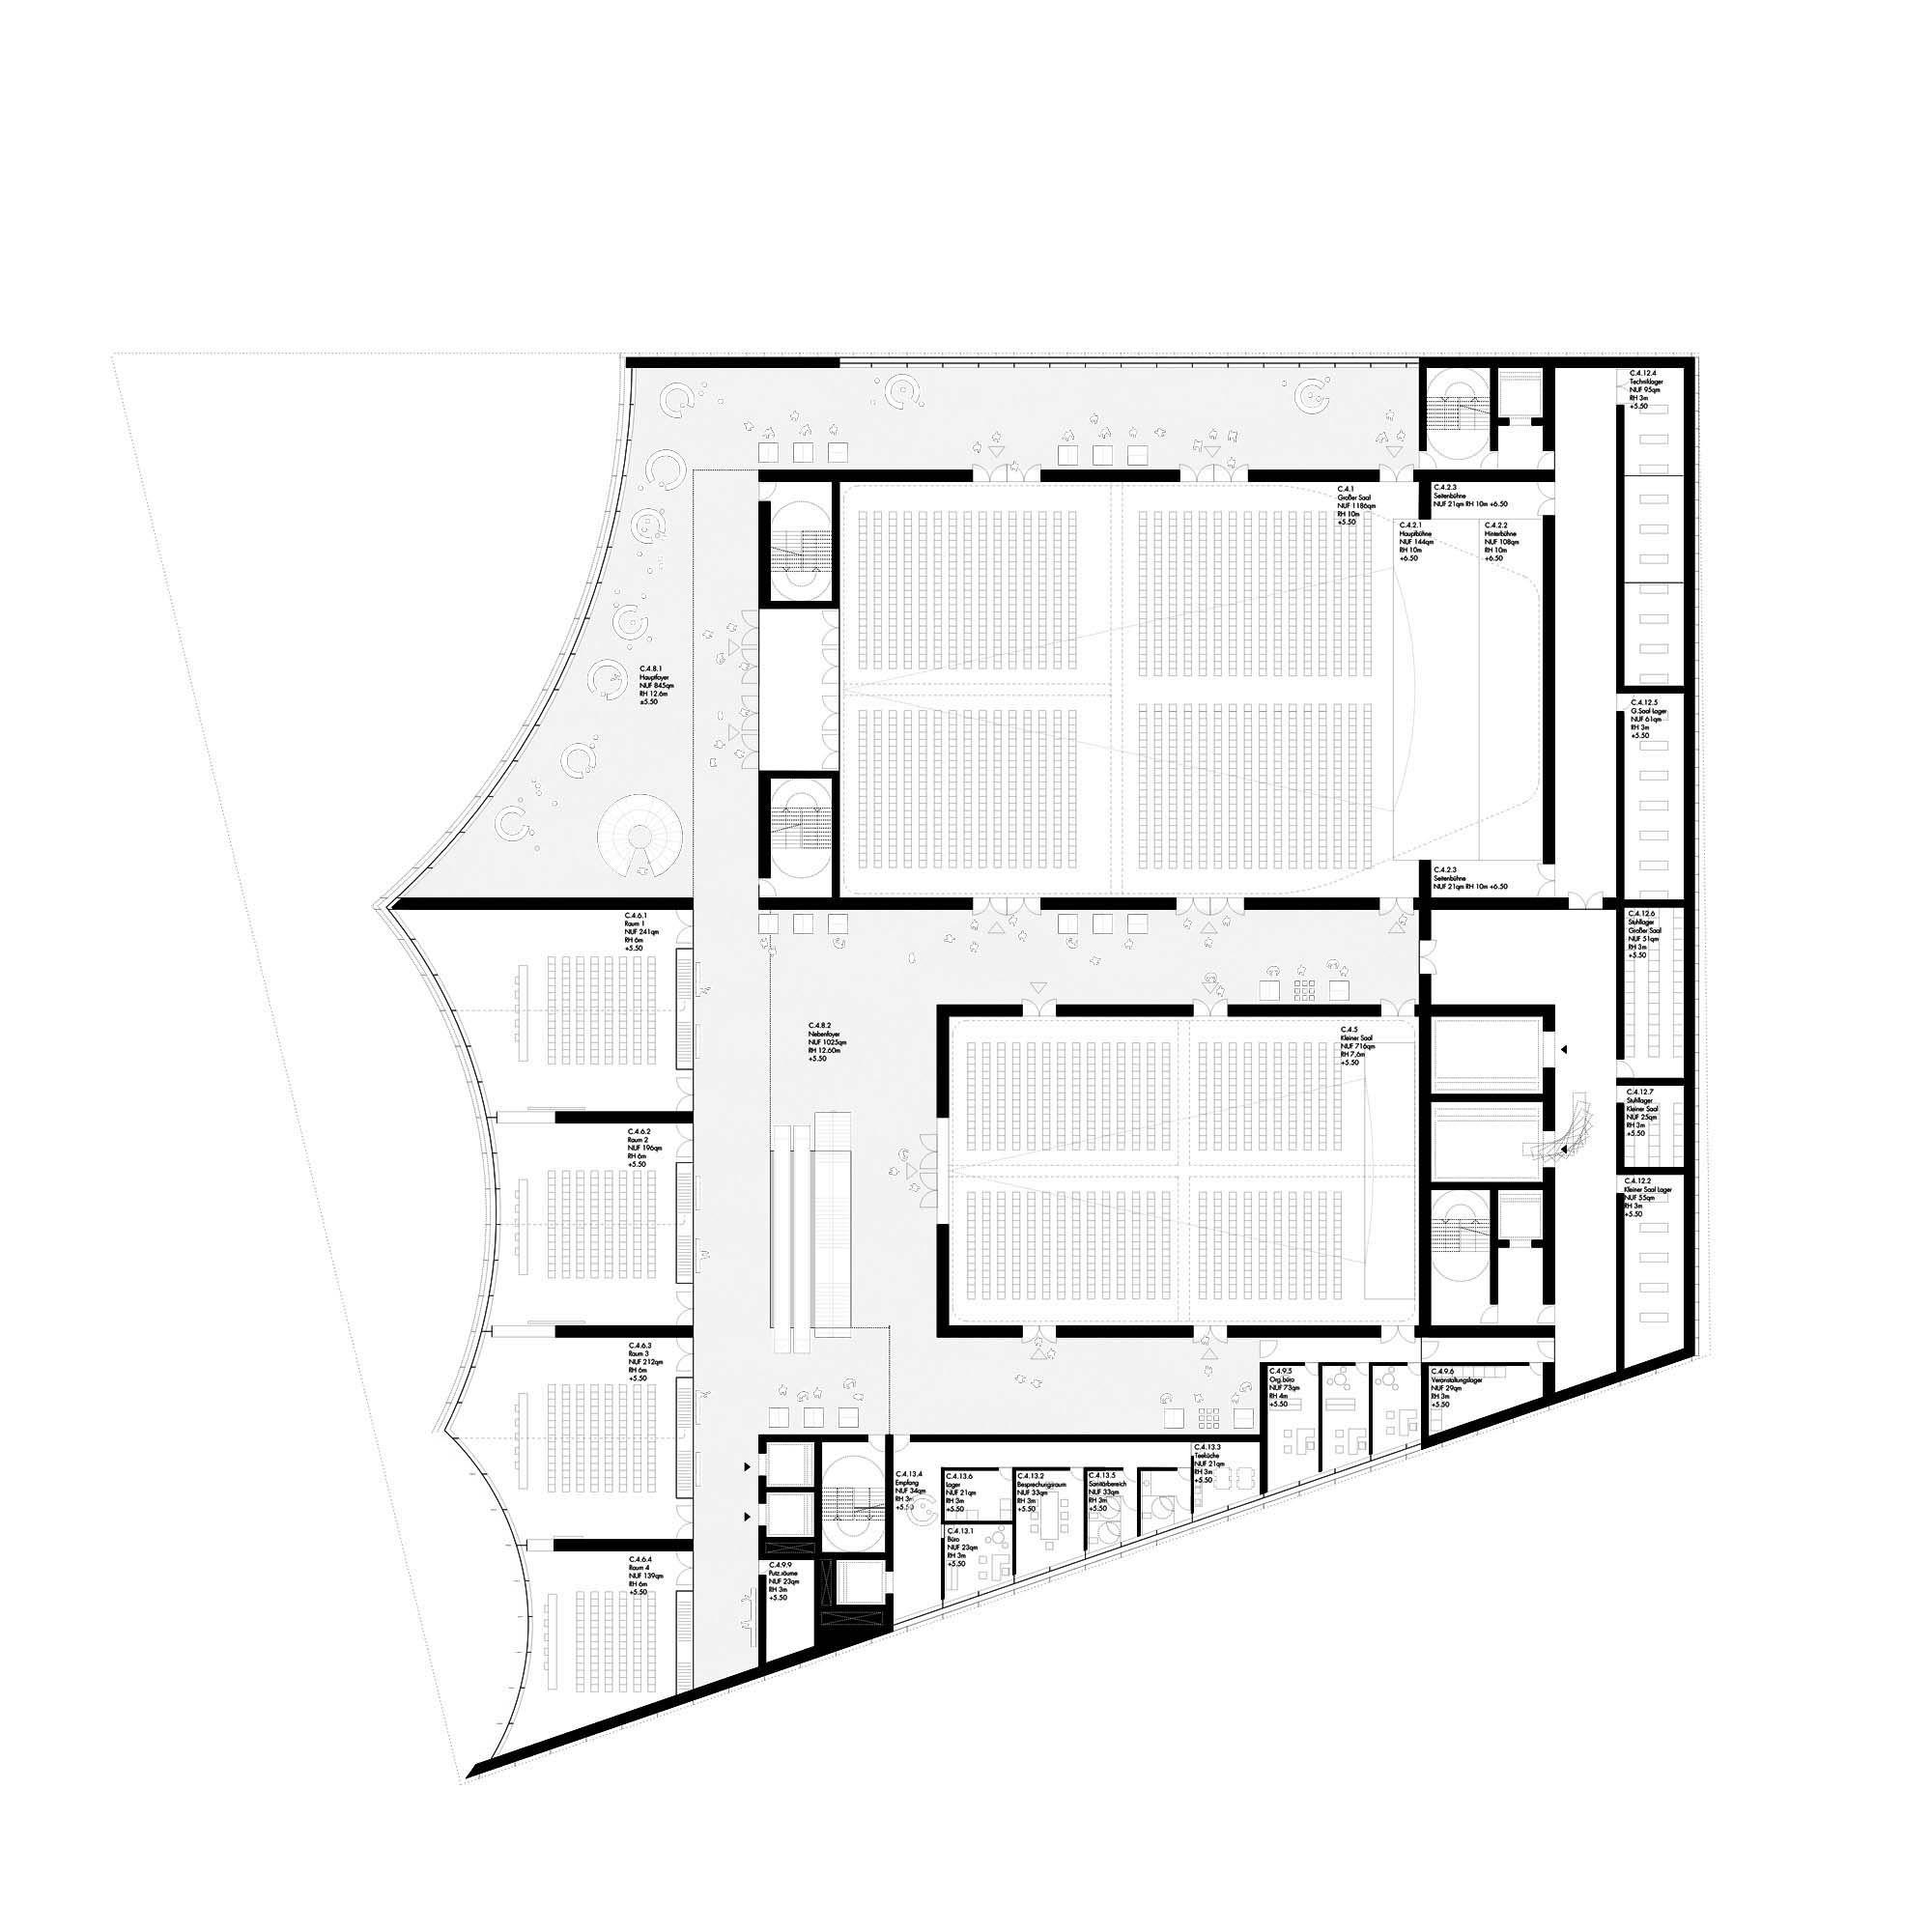 2. Preis Grundriss, © Nieto Sobejano Arquitectos (mit